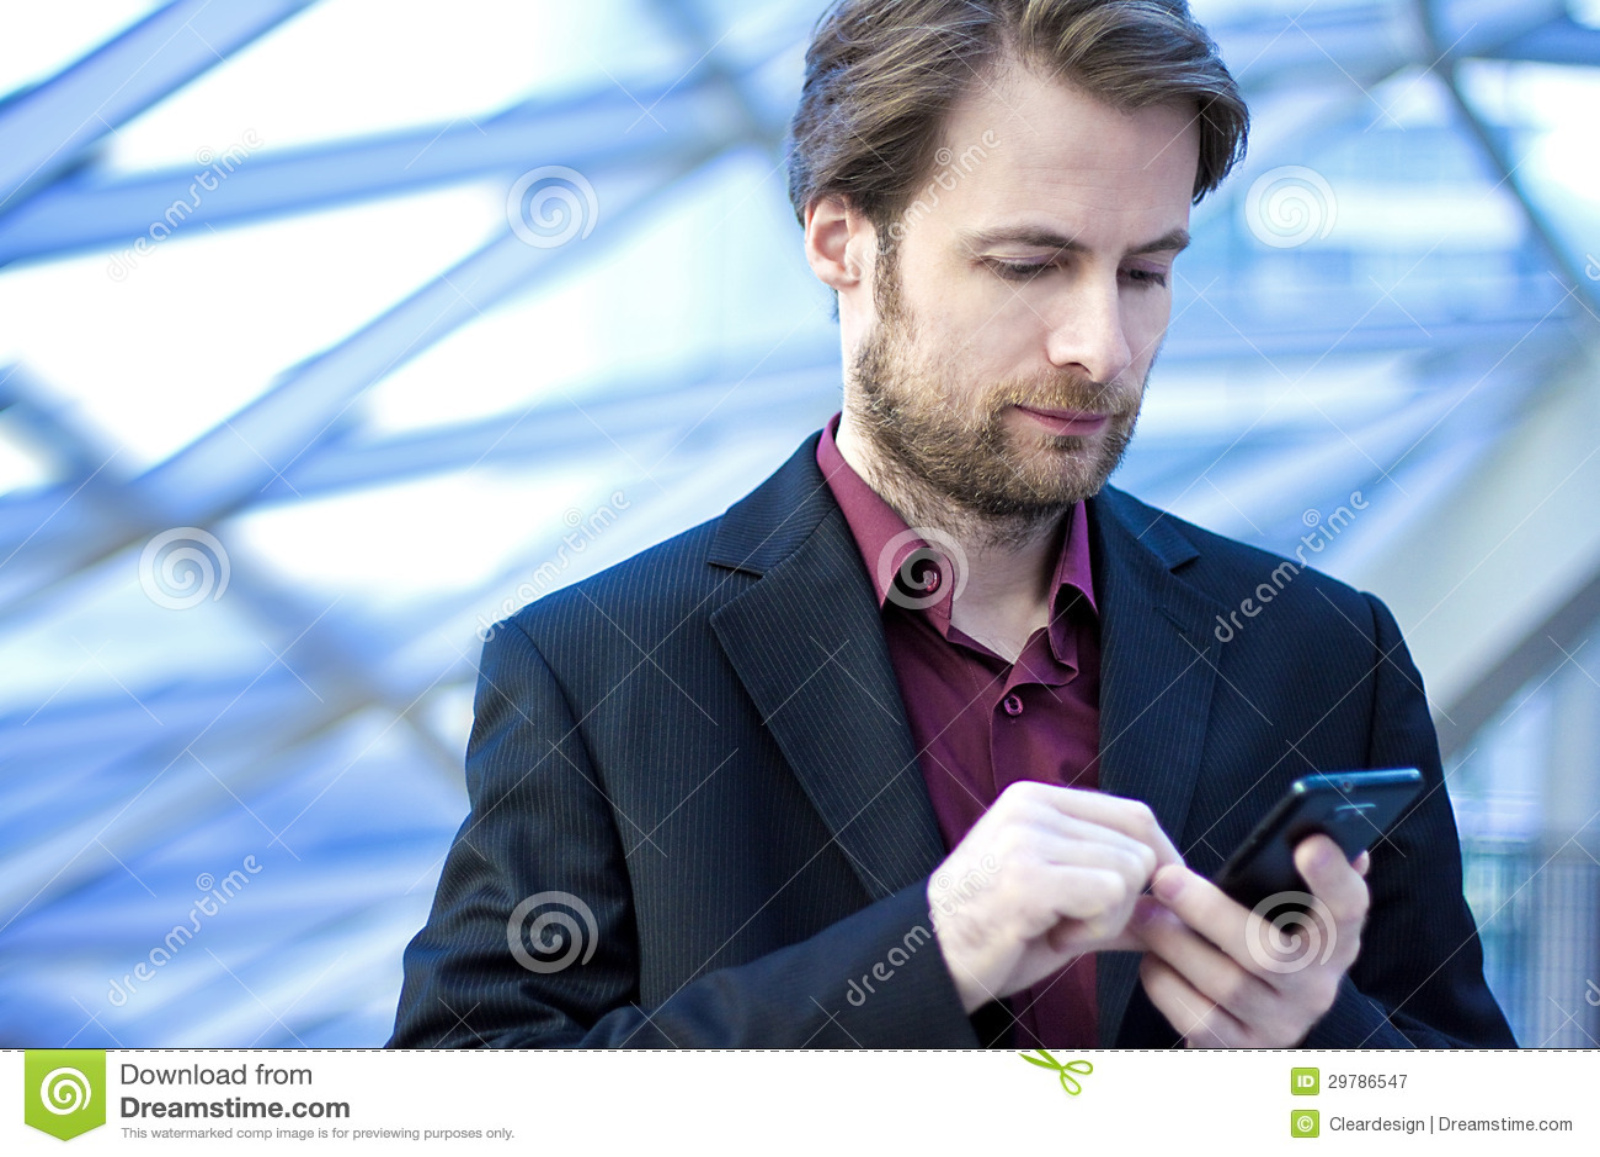 inside man free mobile download